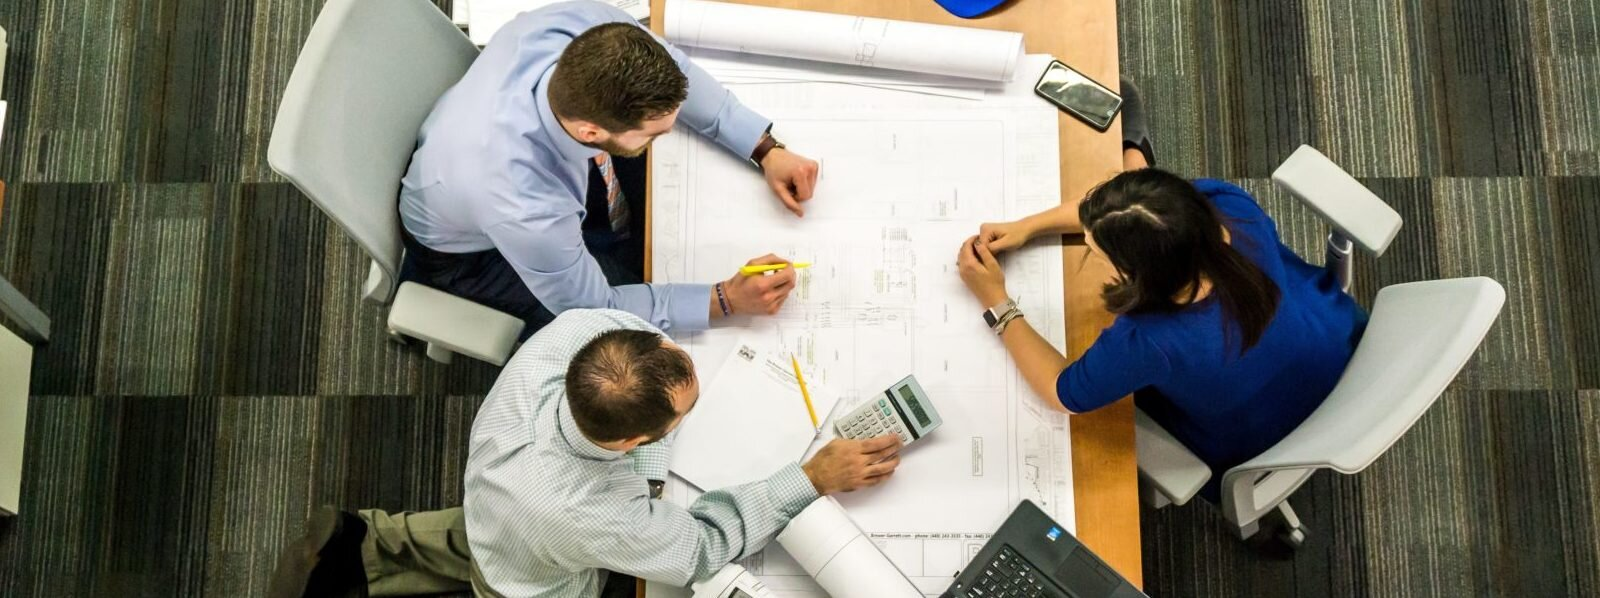 adult-architect-blueprint-416405-e1541695222220-1600x598.jpg